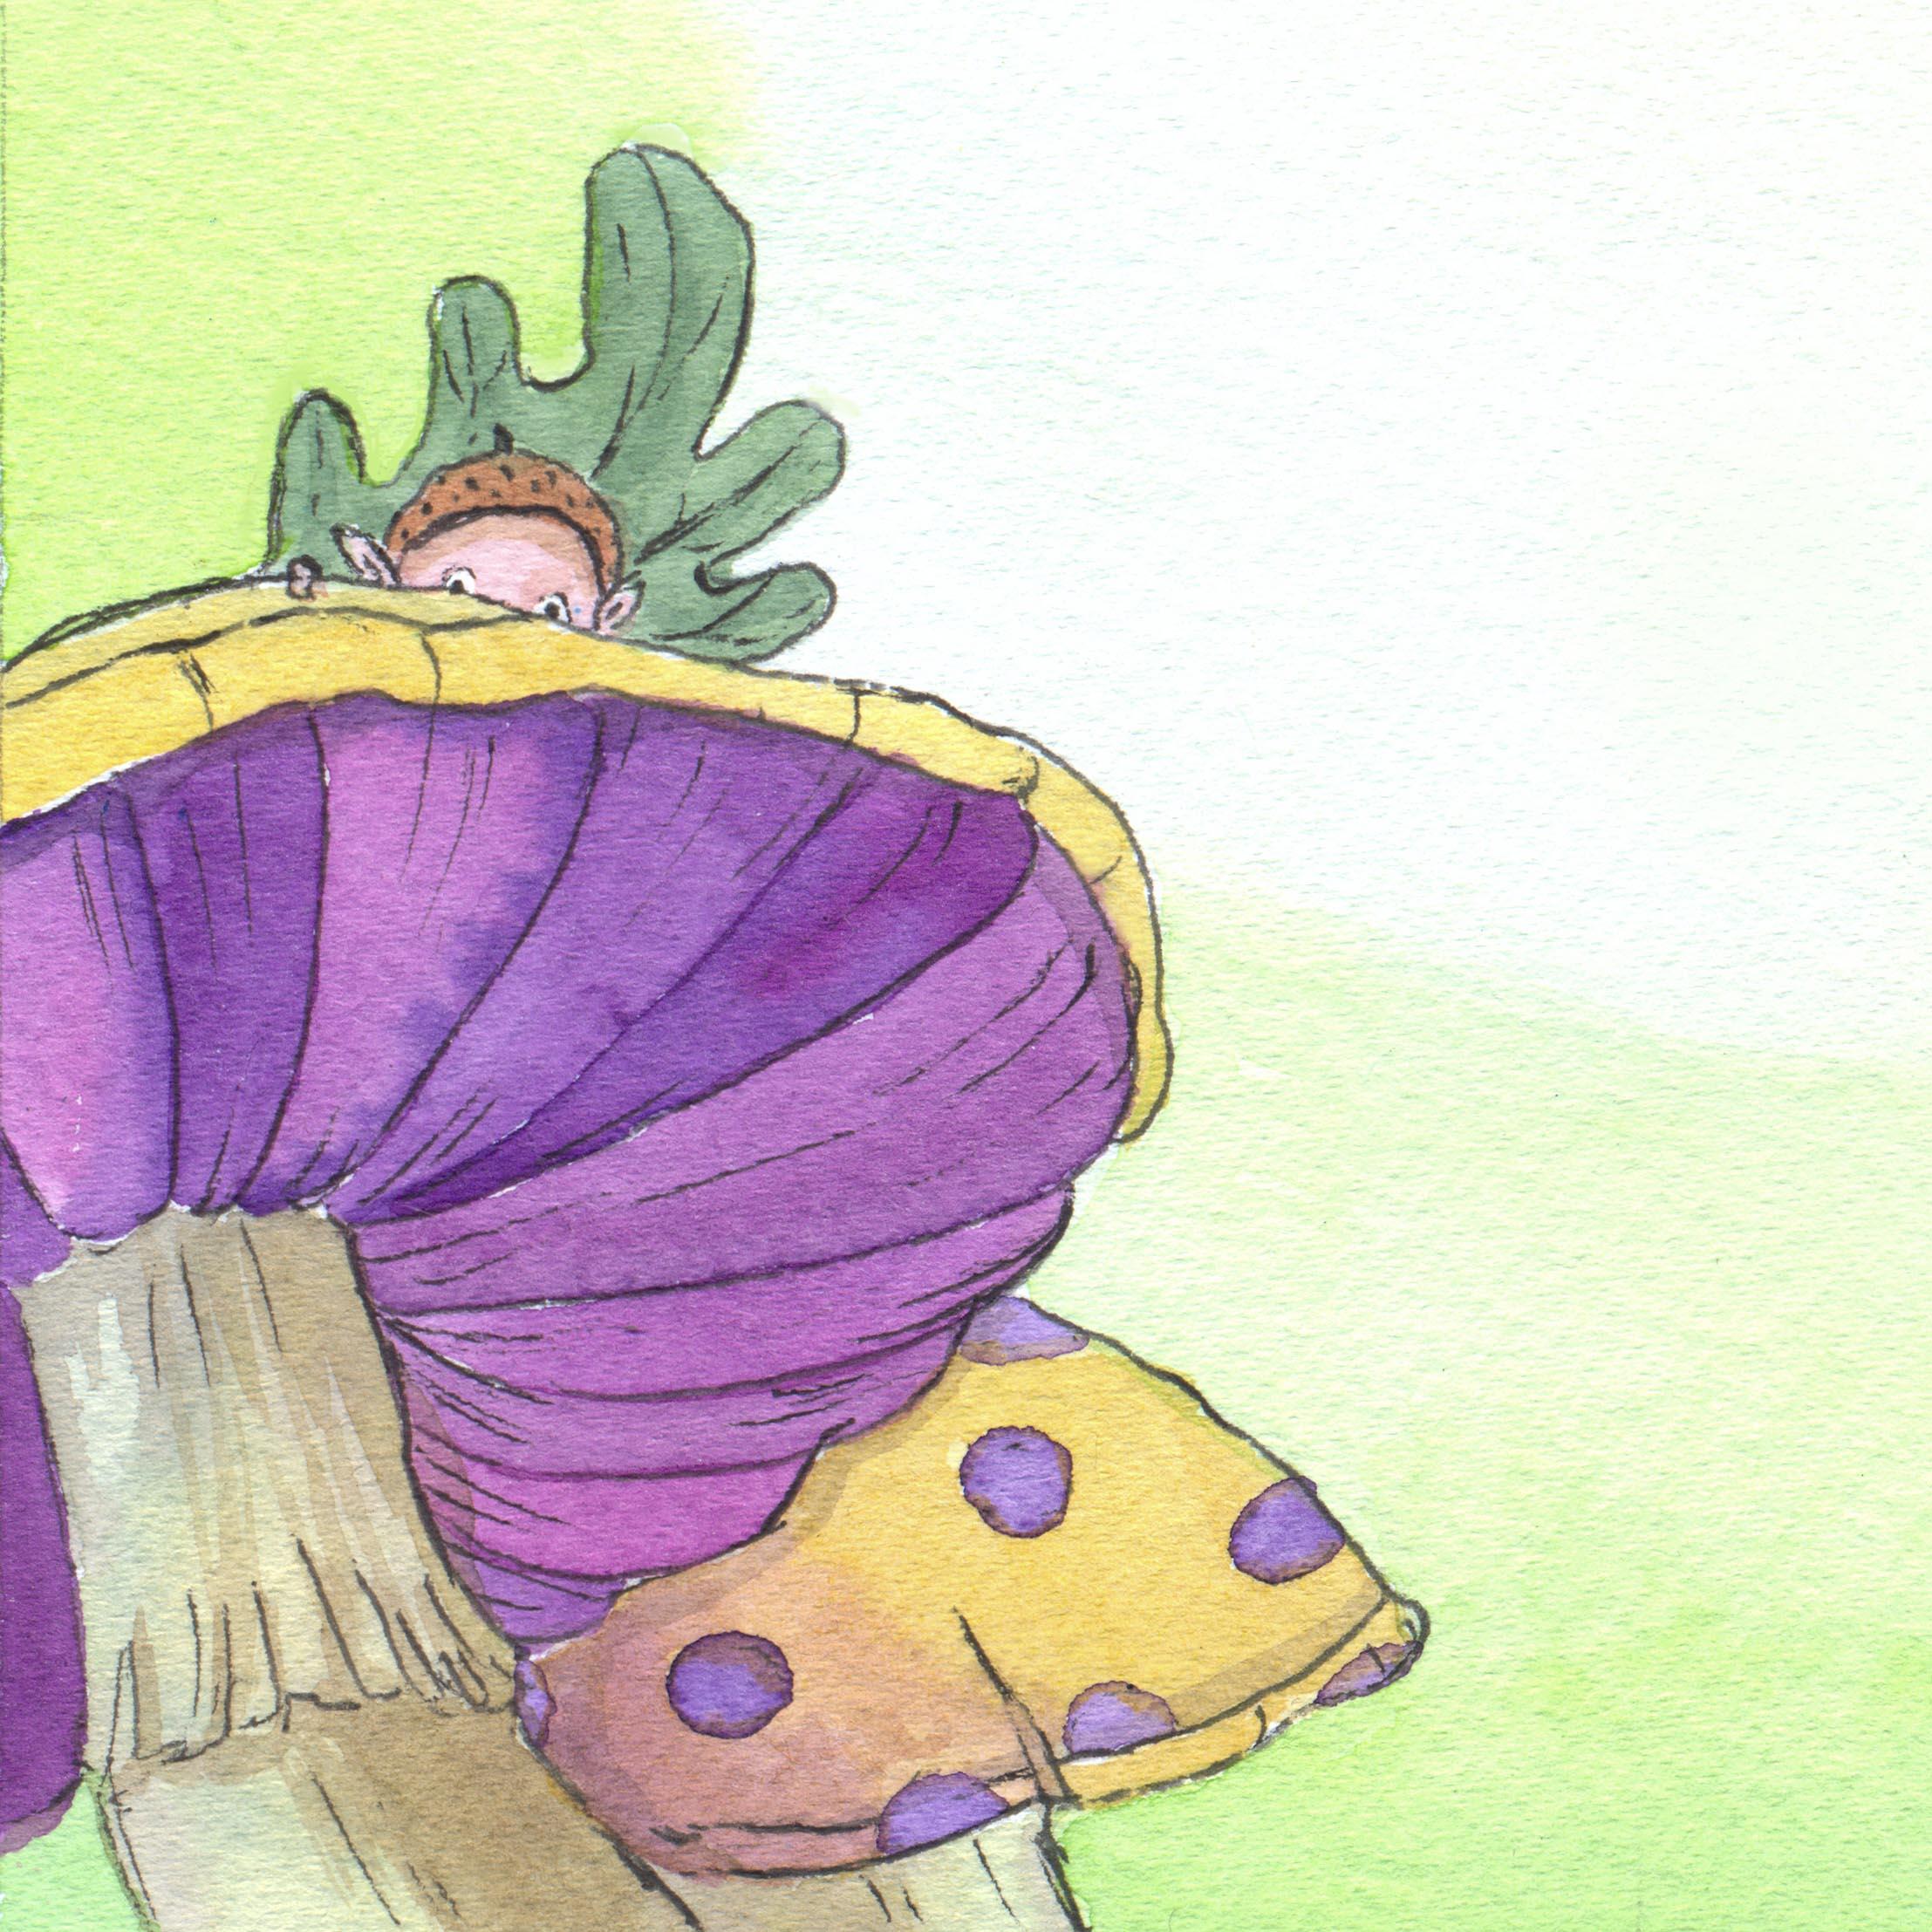 Mashroom and elf drawing detail